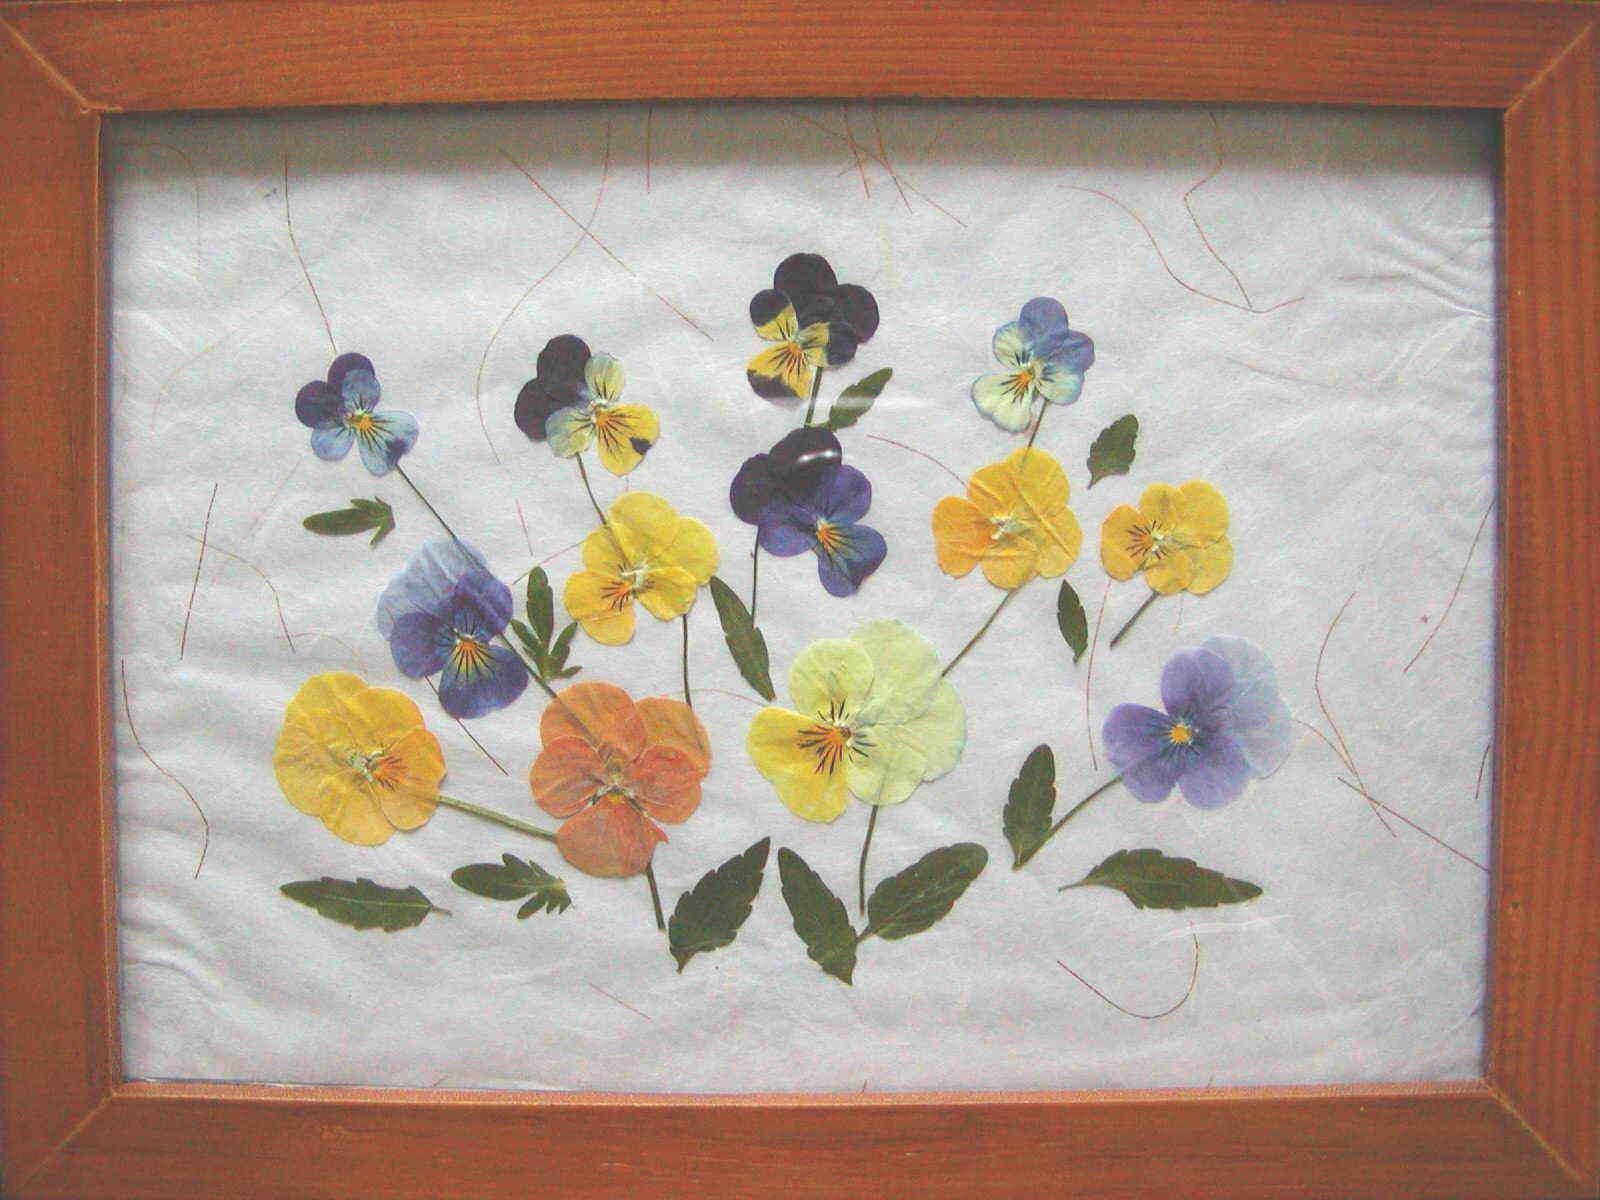 oshi281 - 初心者向け押し花の作り方